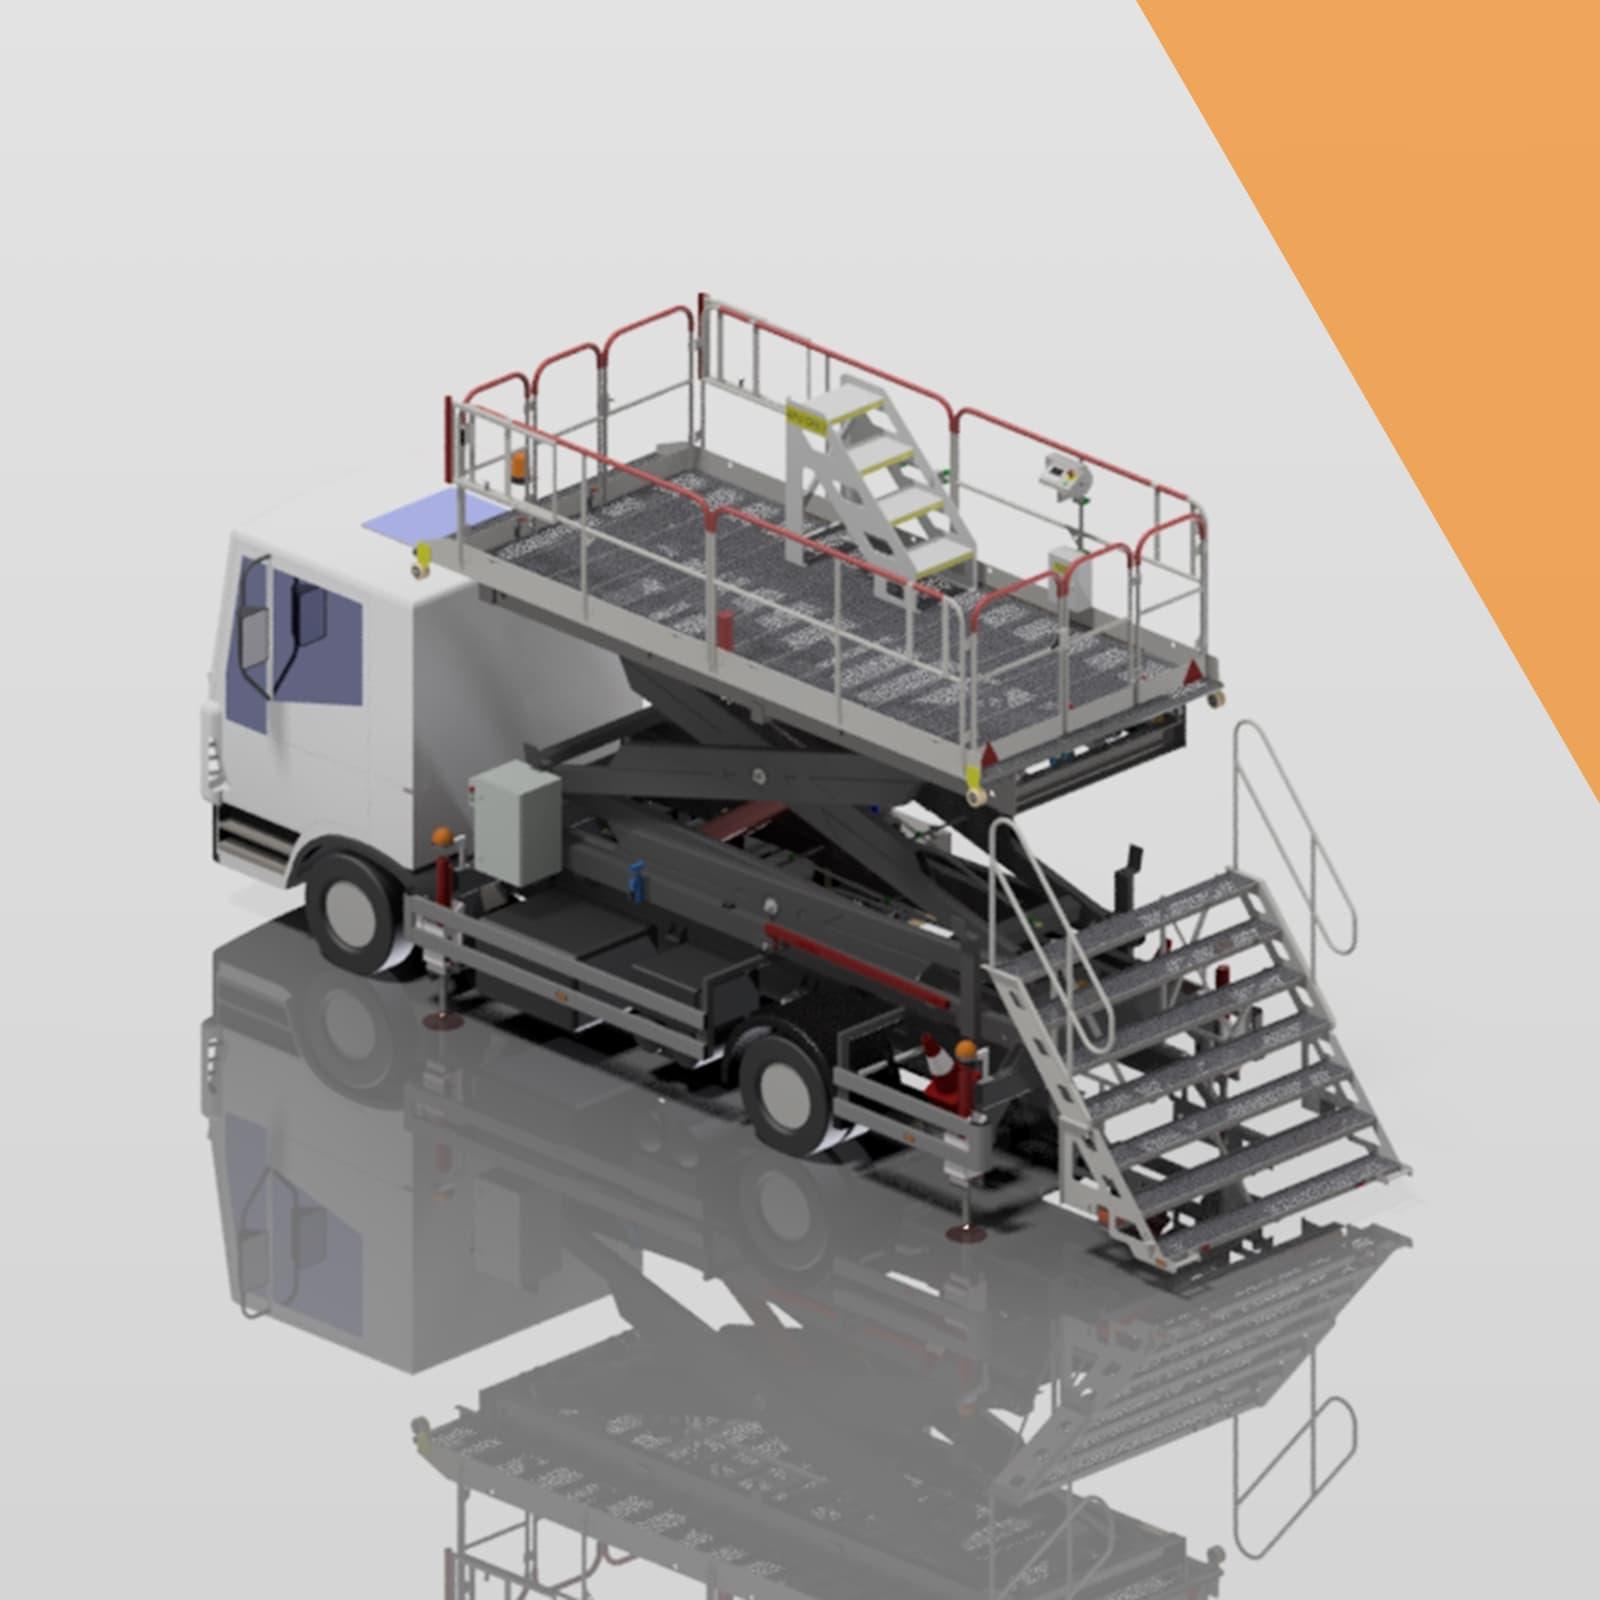 Medium vehicle mounted scissor lifts